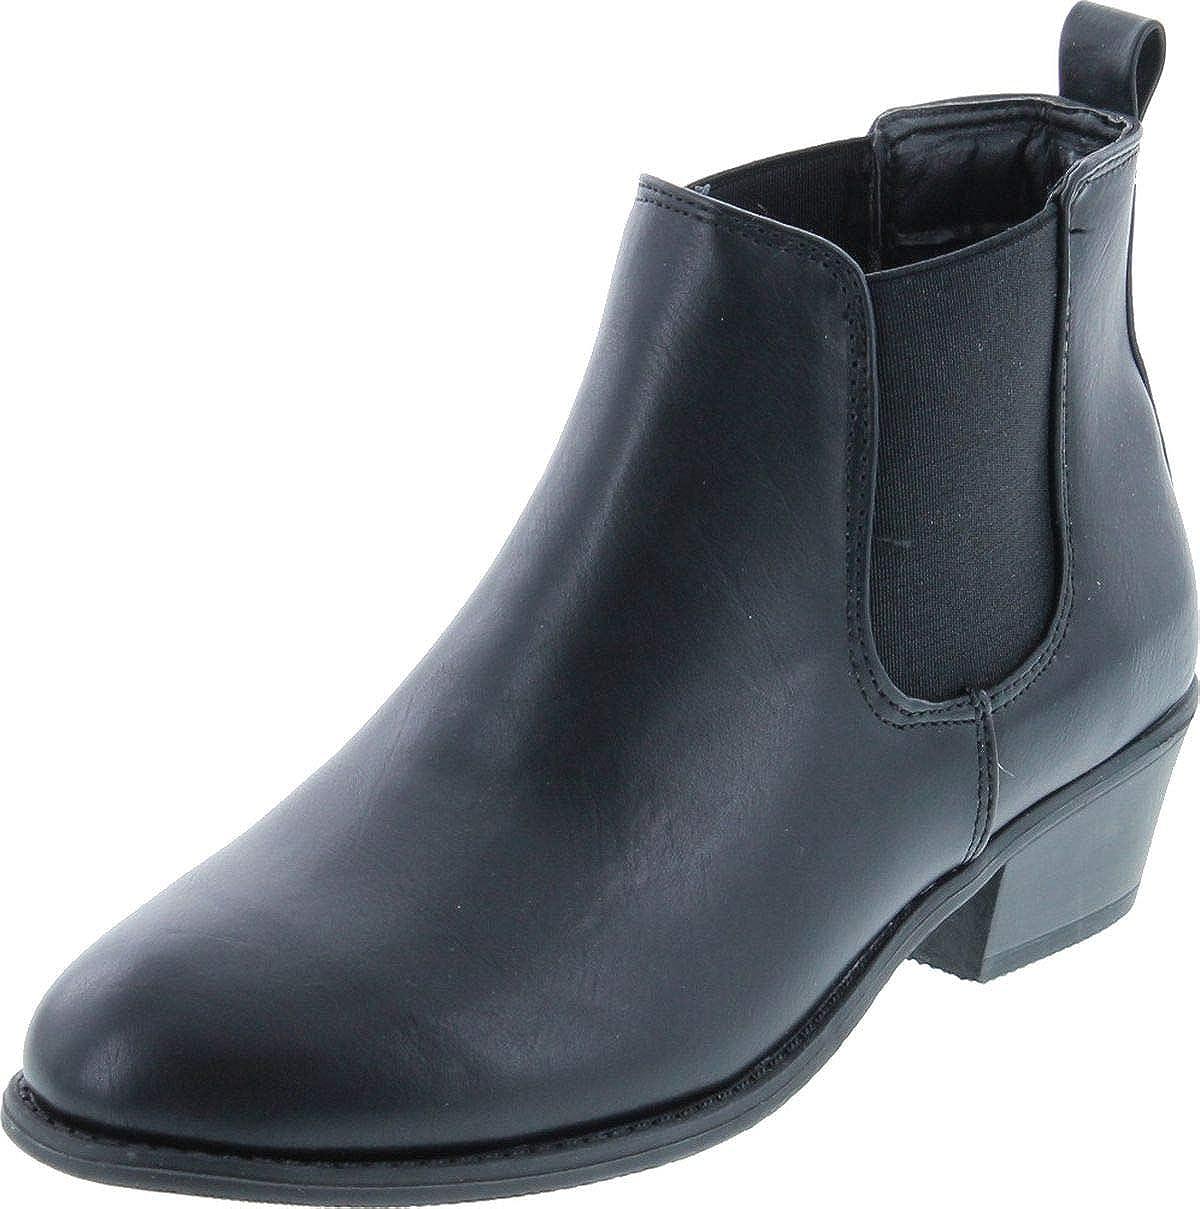 REFRESH Tildon-02 Women's Almond Toe Simple Flat Heel Ankle Riding Booties